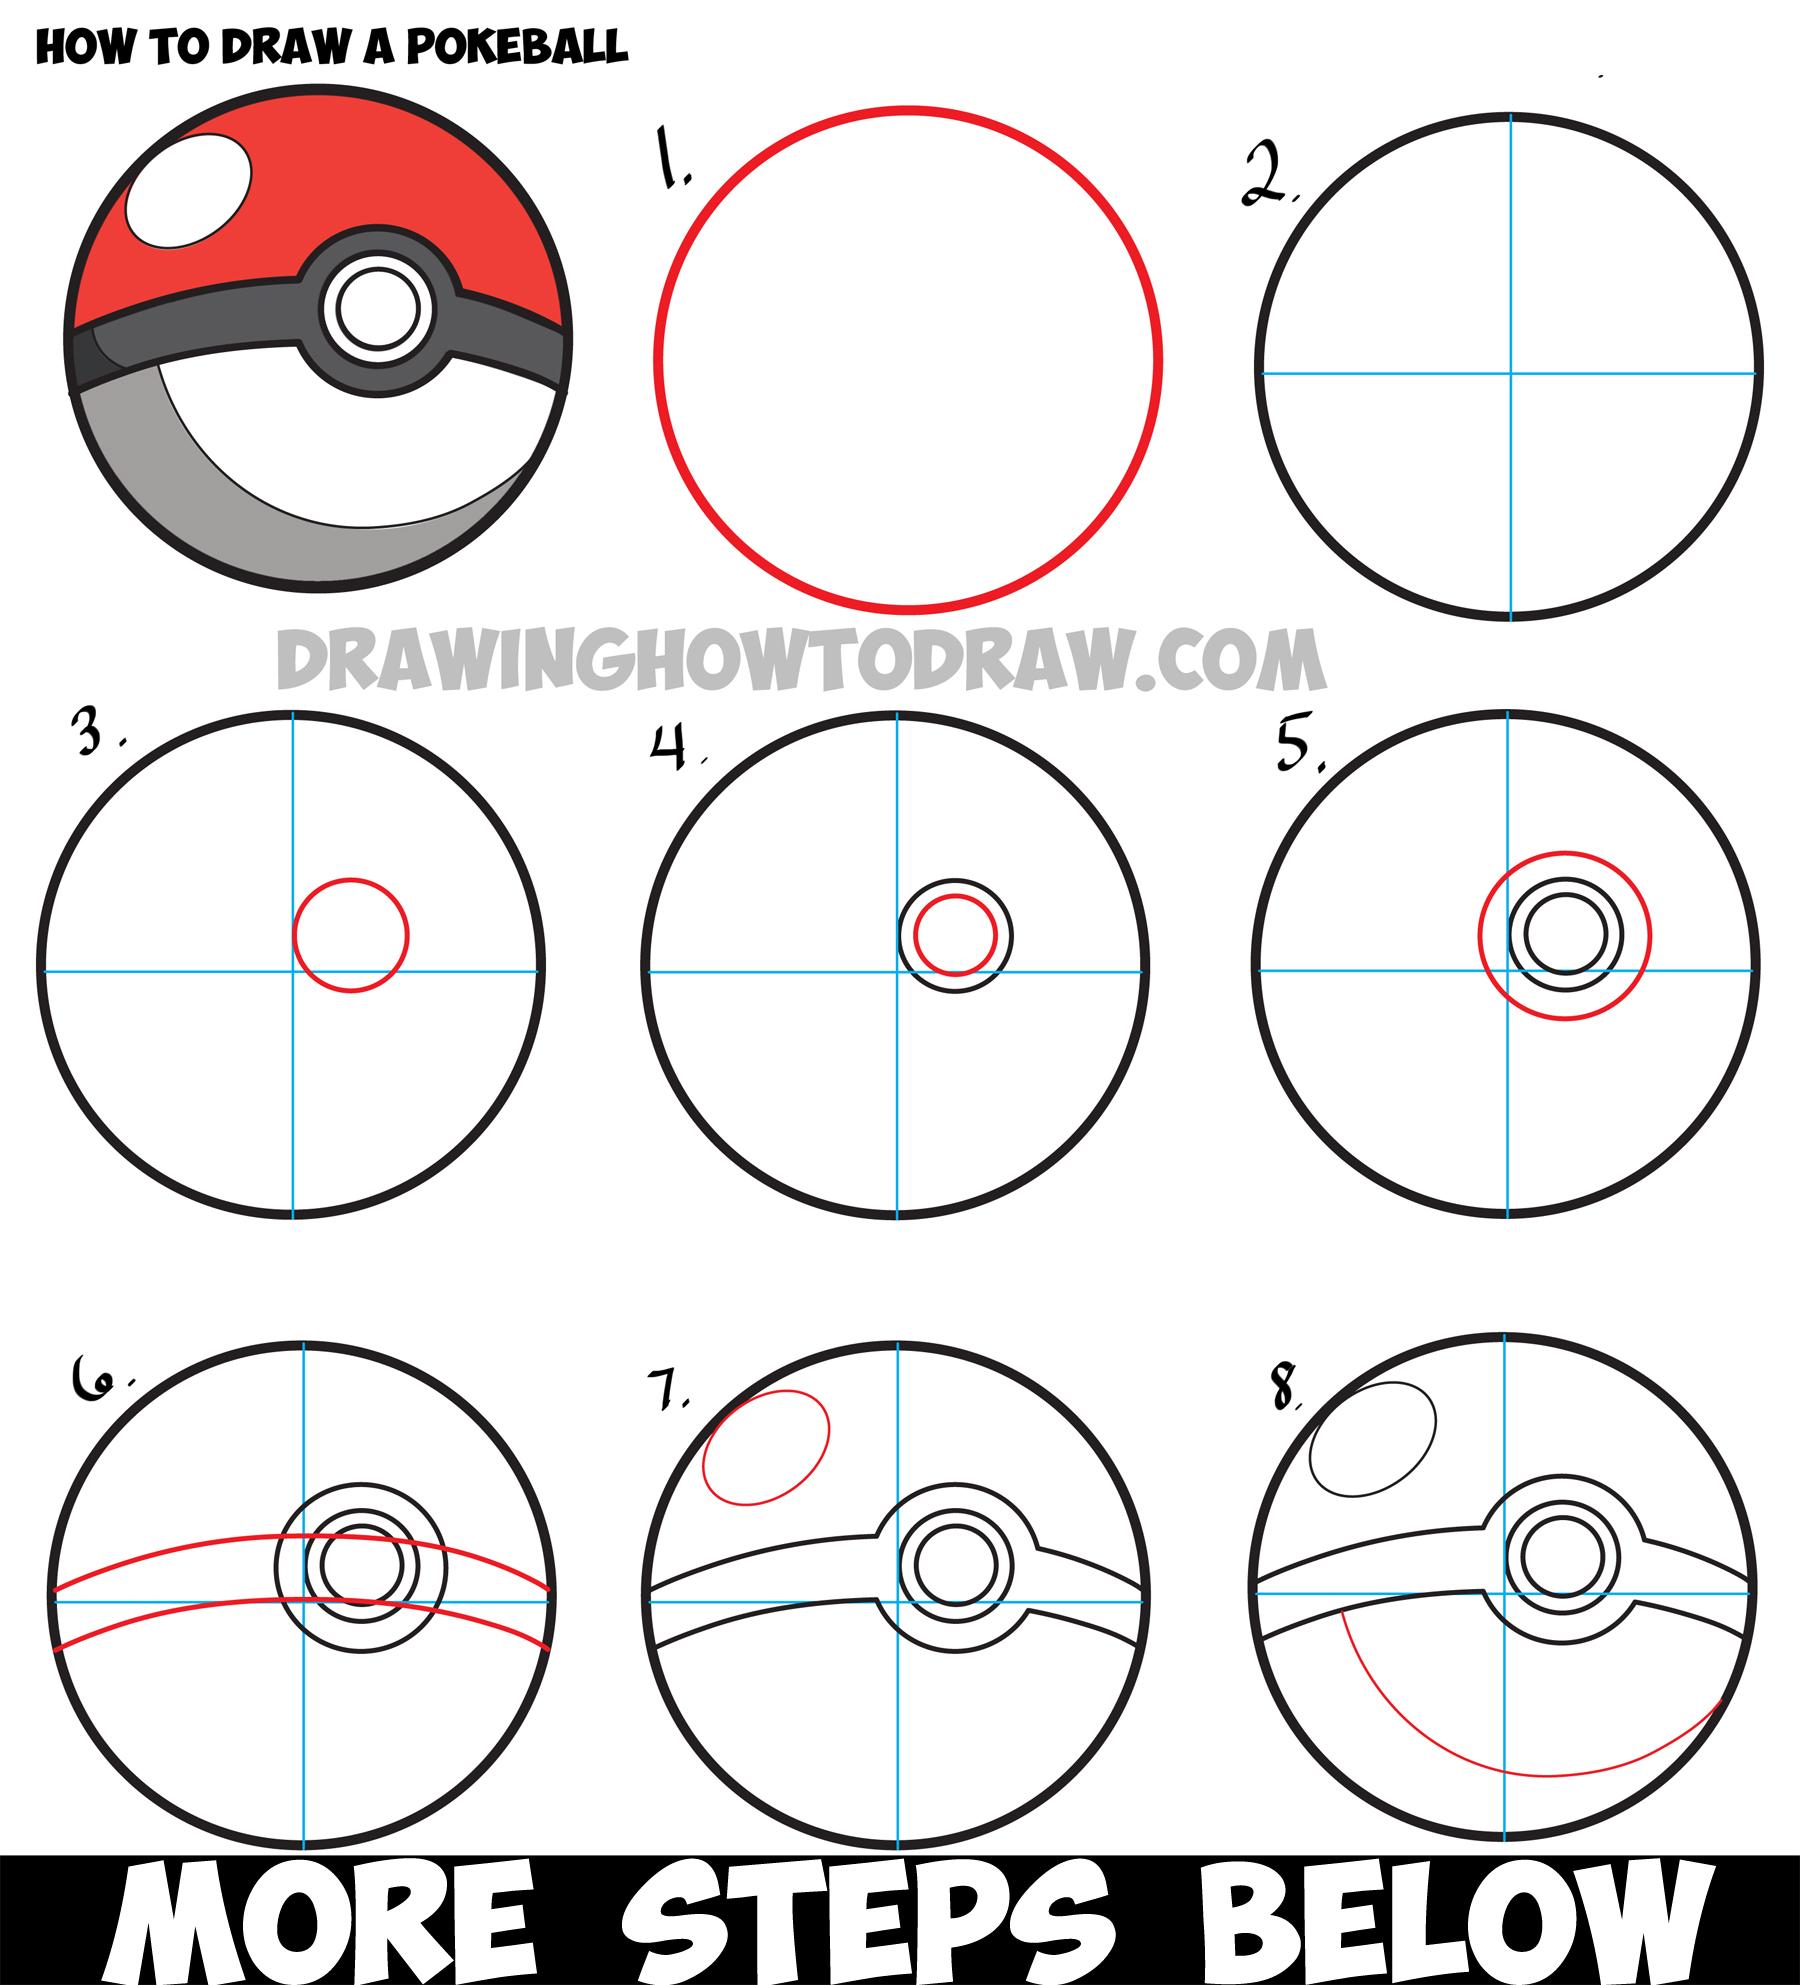 Drawn pokeball drawing Easy Pokeball Drawing Pokemon Step